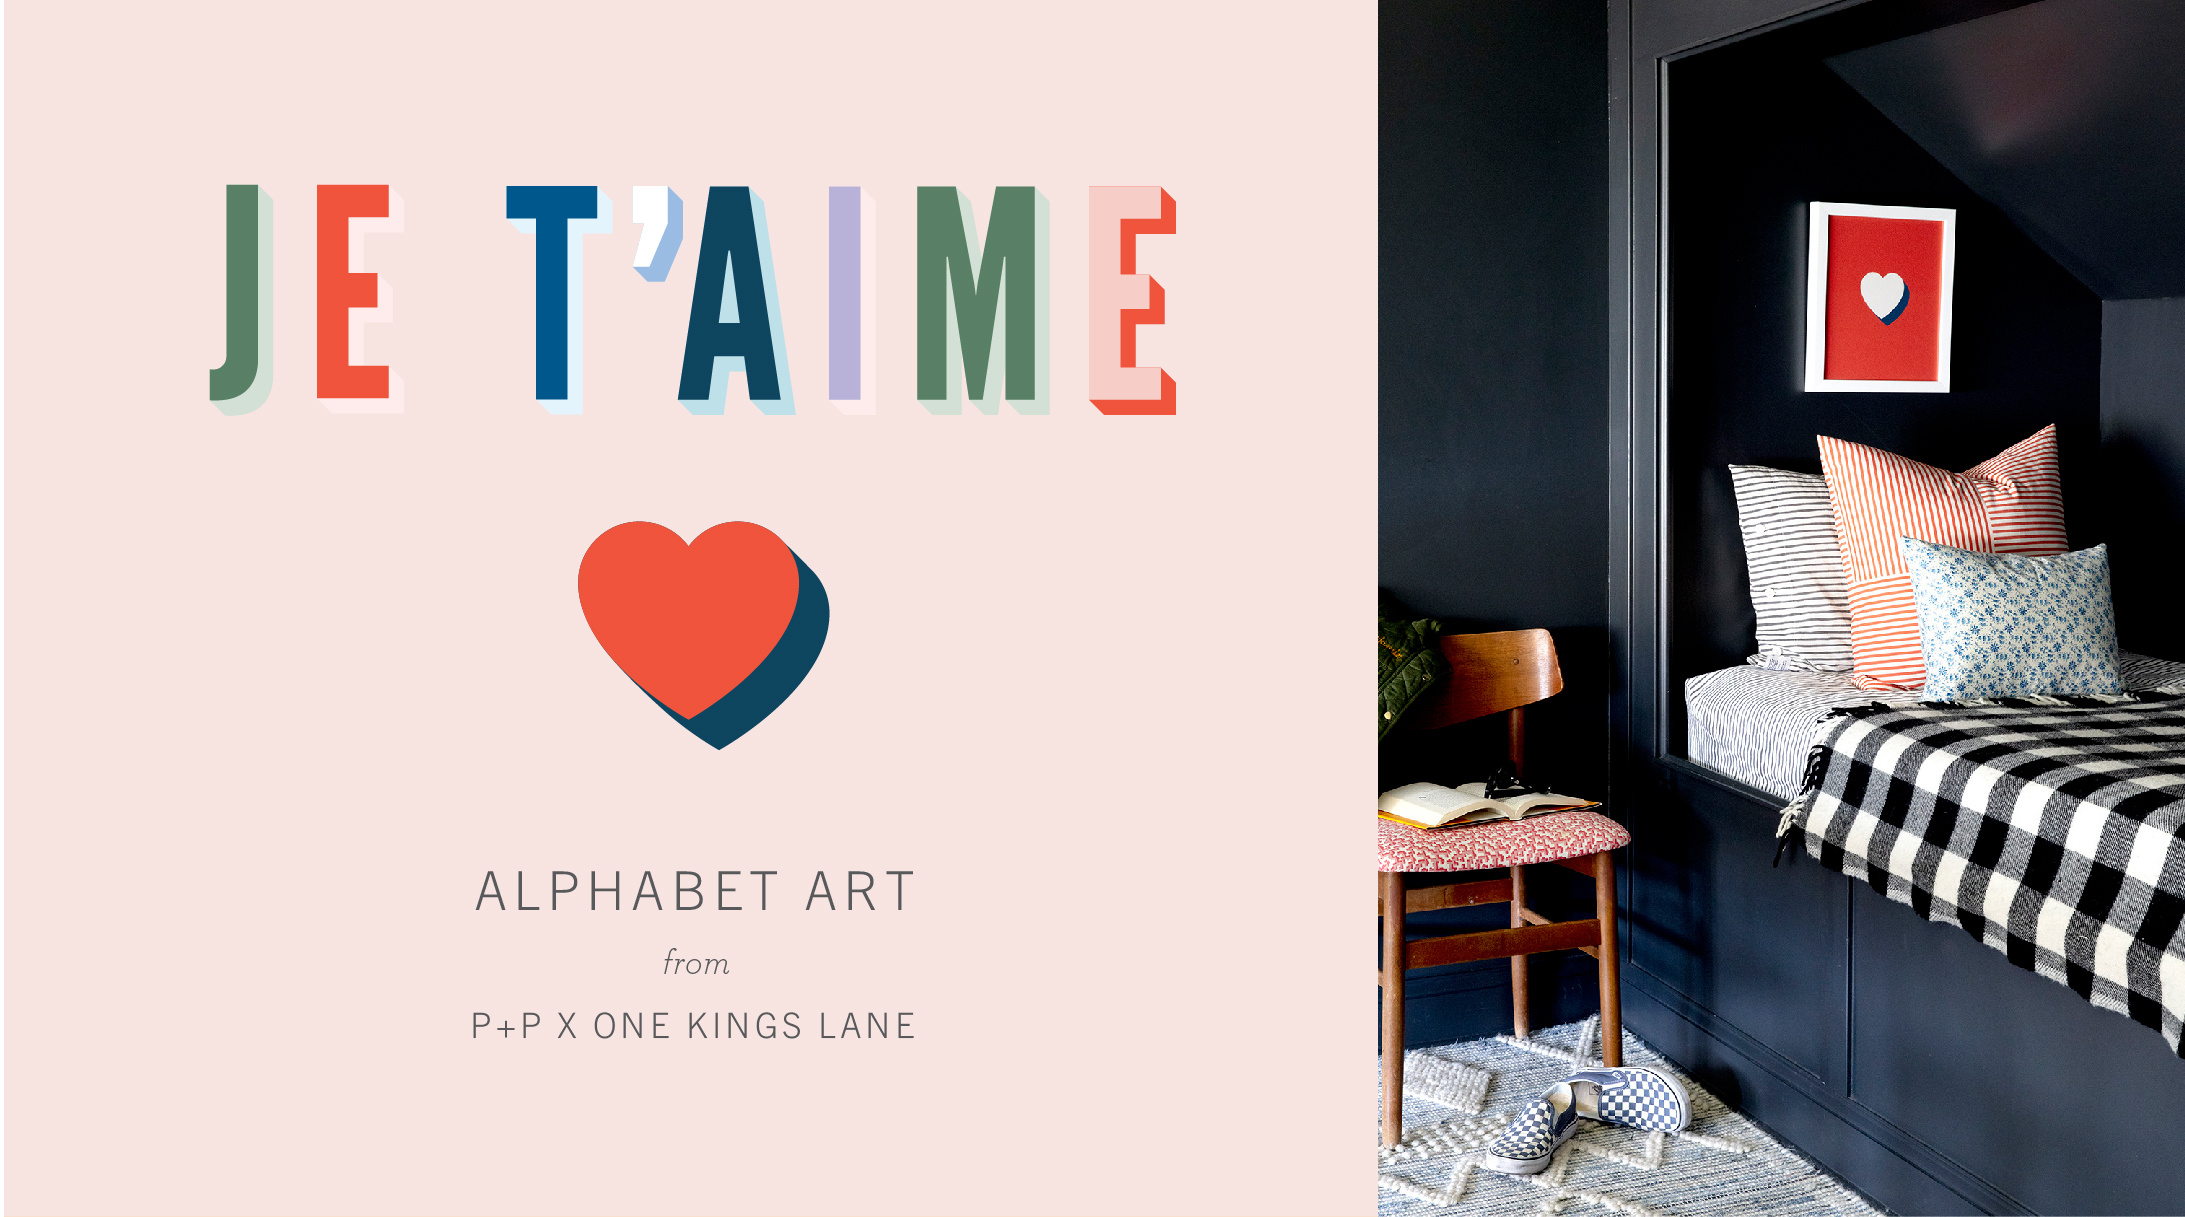 Alphabet_Art_Homepage_Assets-06.jpg